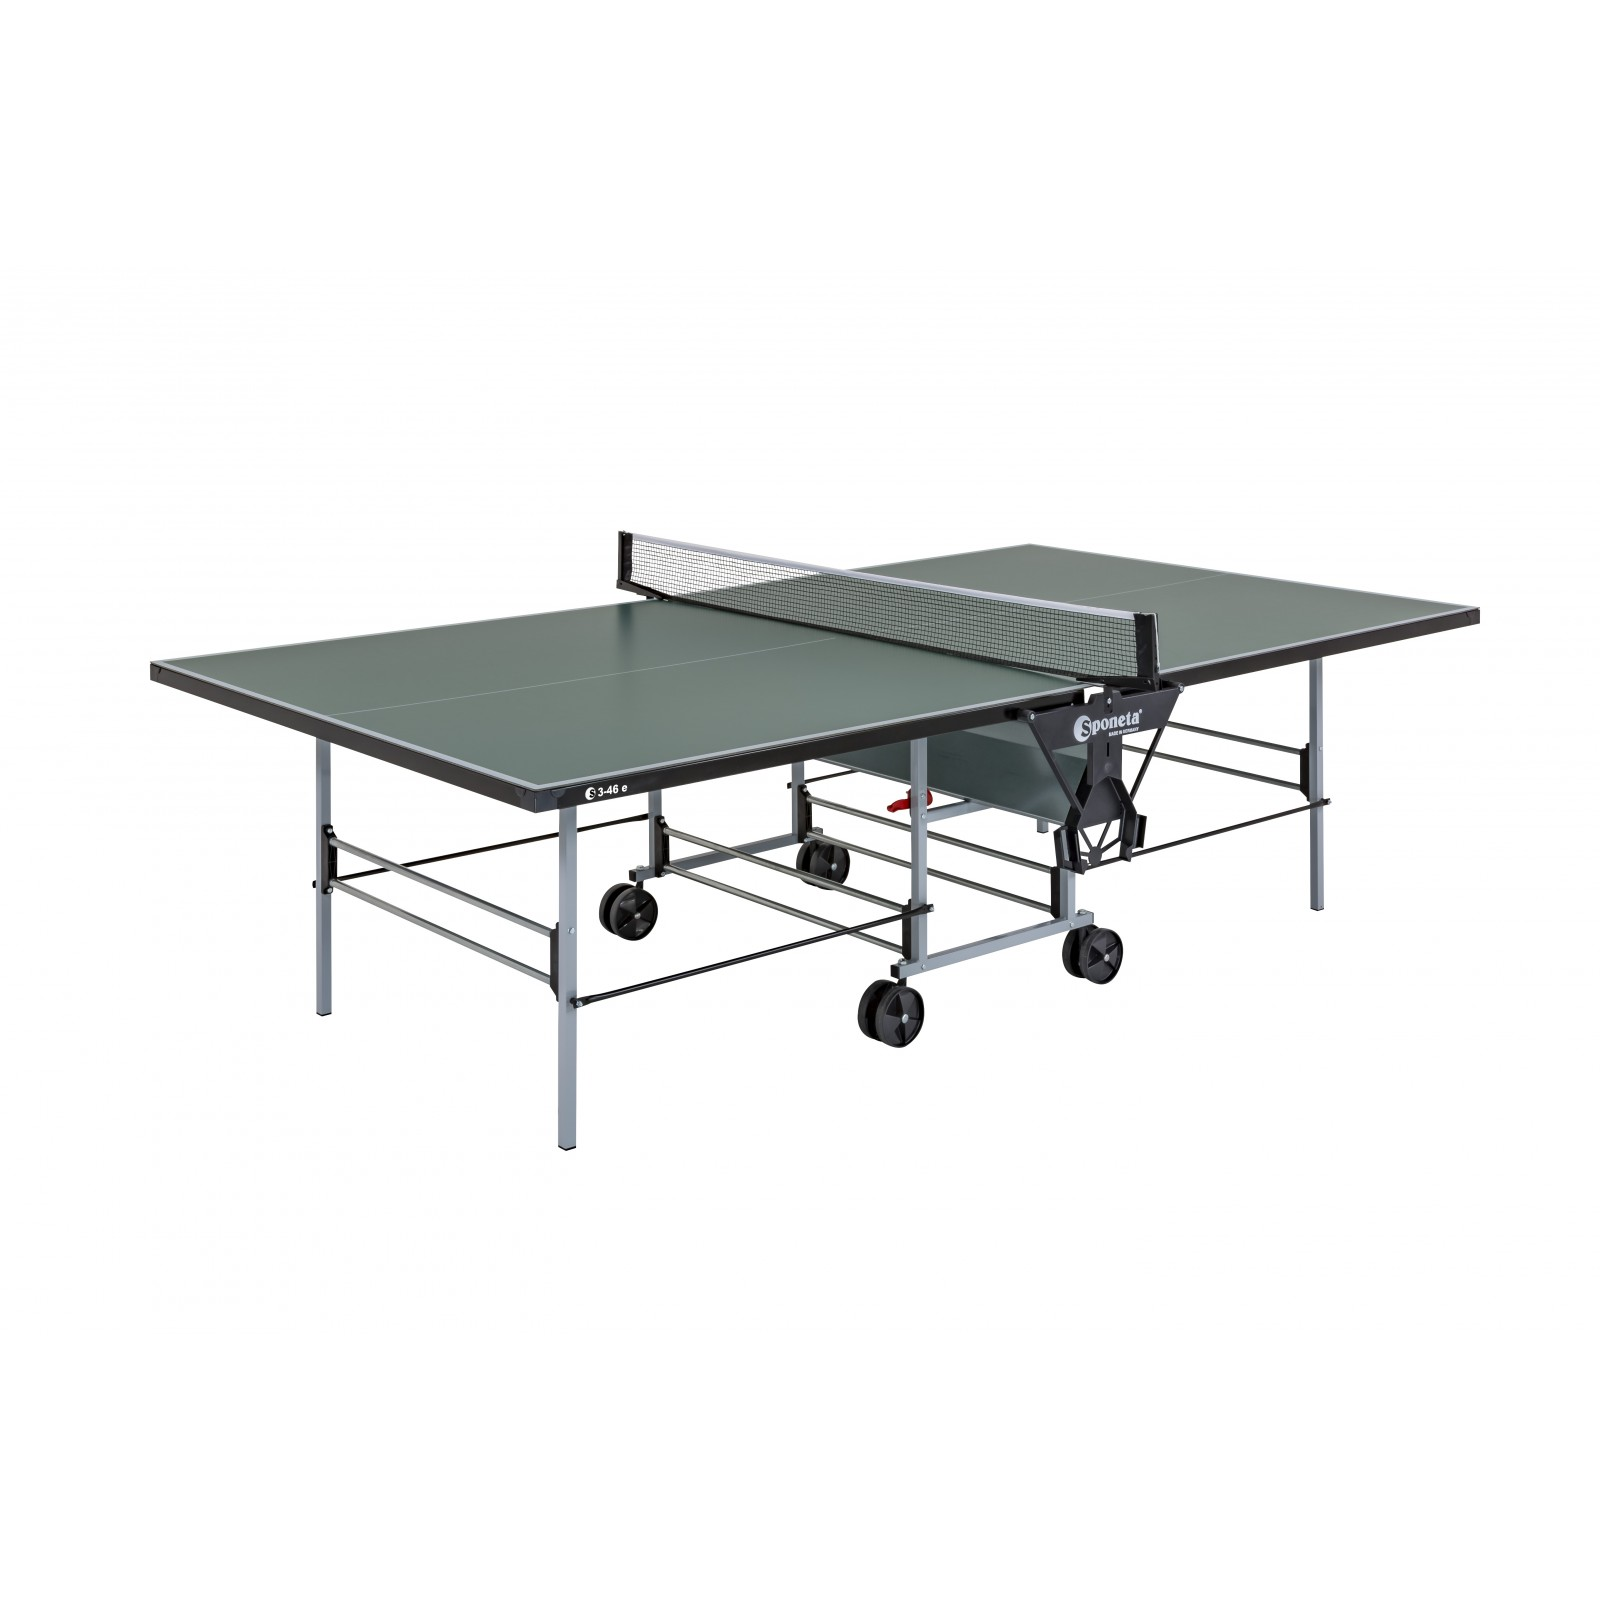 Sponeta table tennis table s3 46e s3 47e buy with 51 customer ratings sport tiedje - Sponeta table tennis table ...